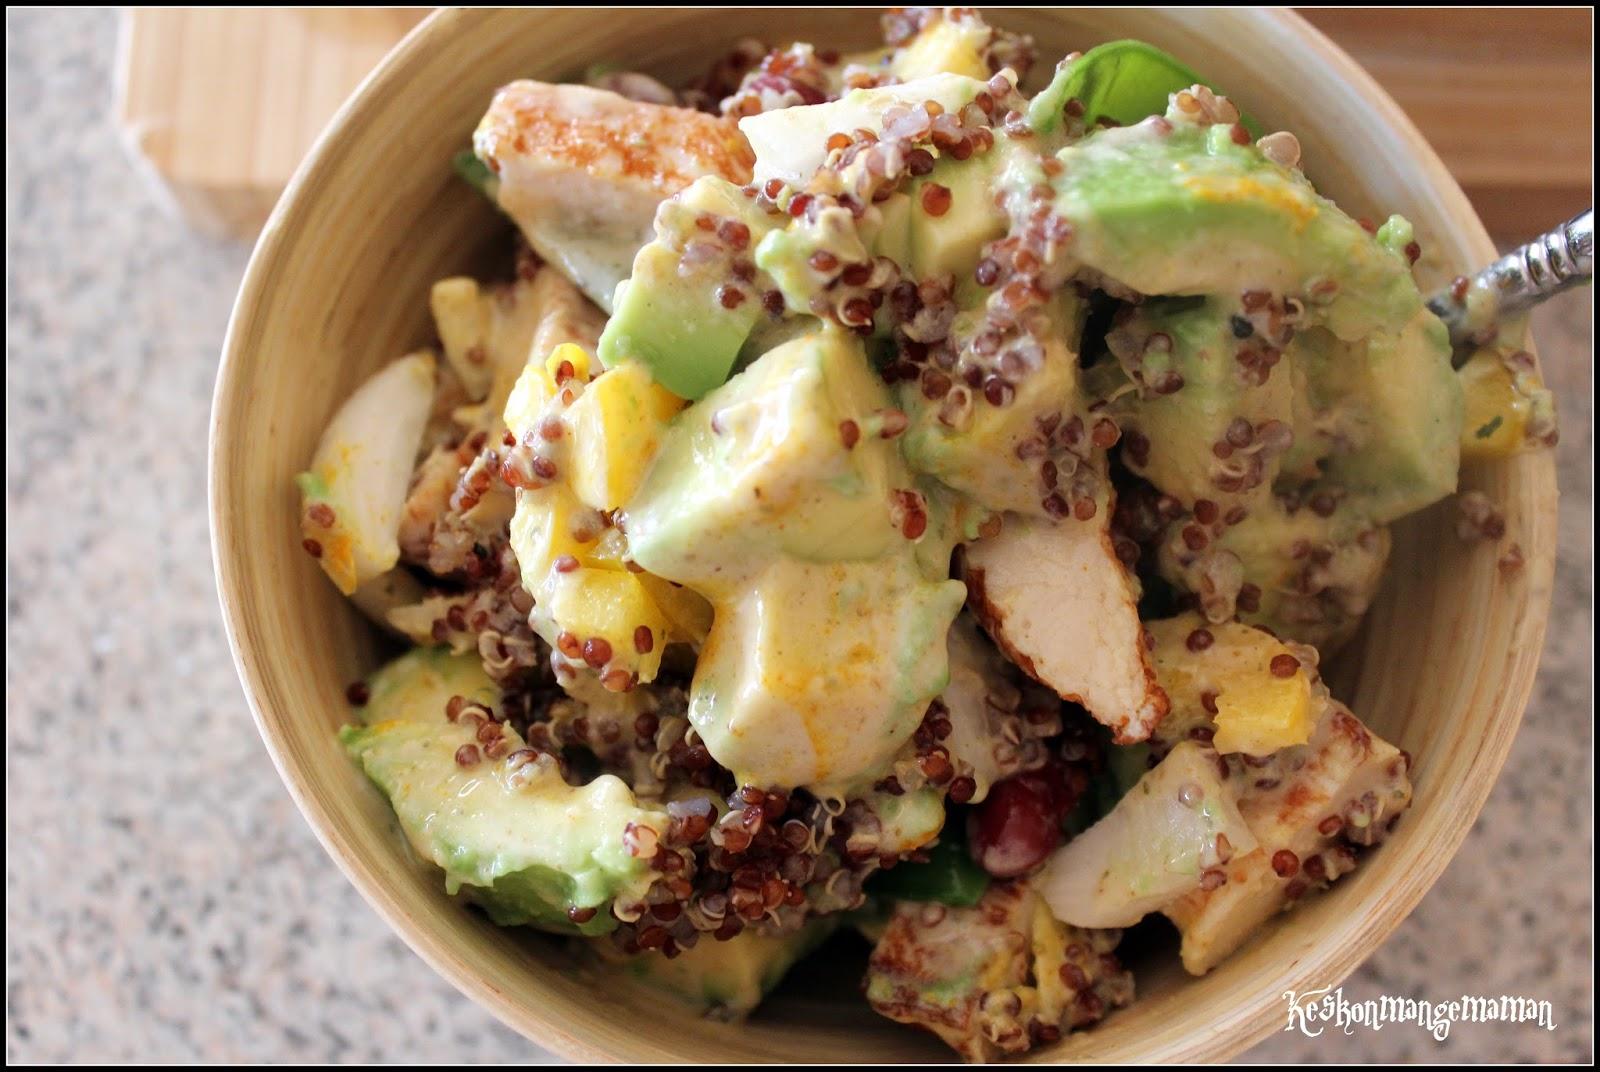 keskonmangemaman salad bowl quinoa et poulet. Black Bedroom Furniture Sets. Home Design Ideas